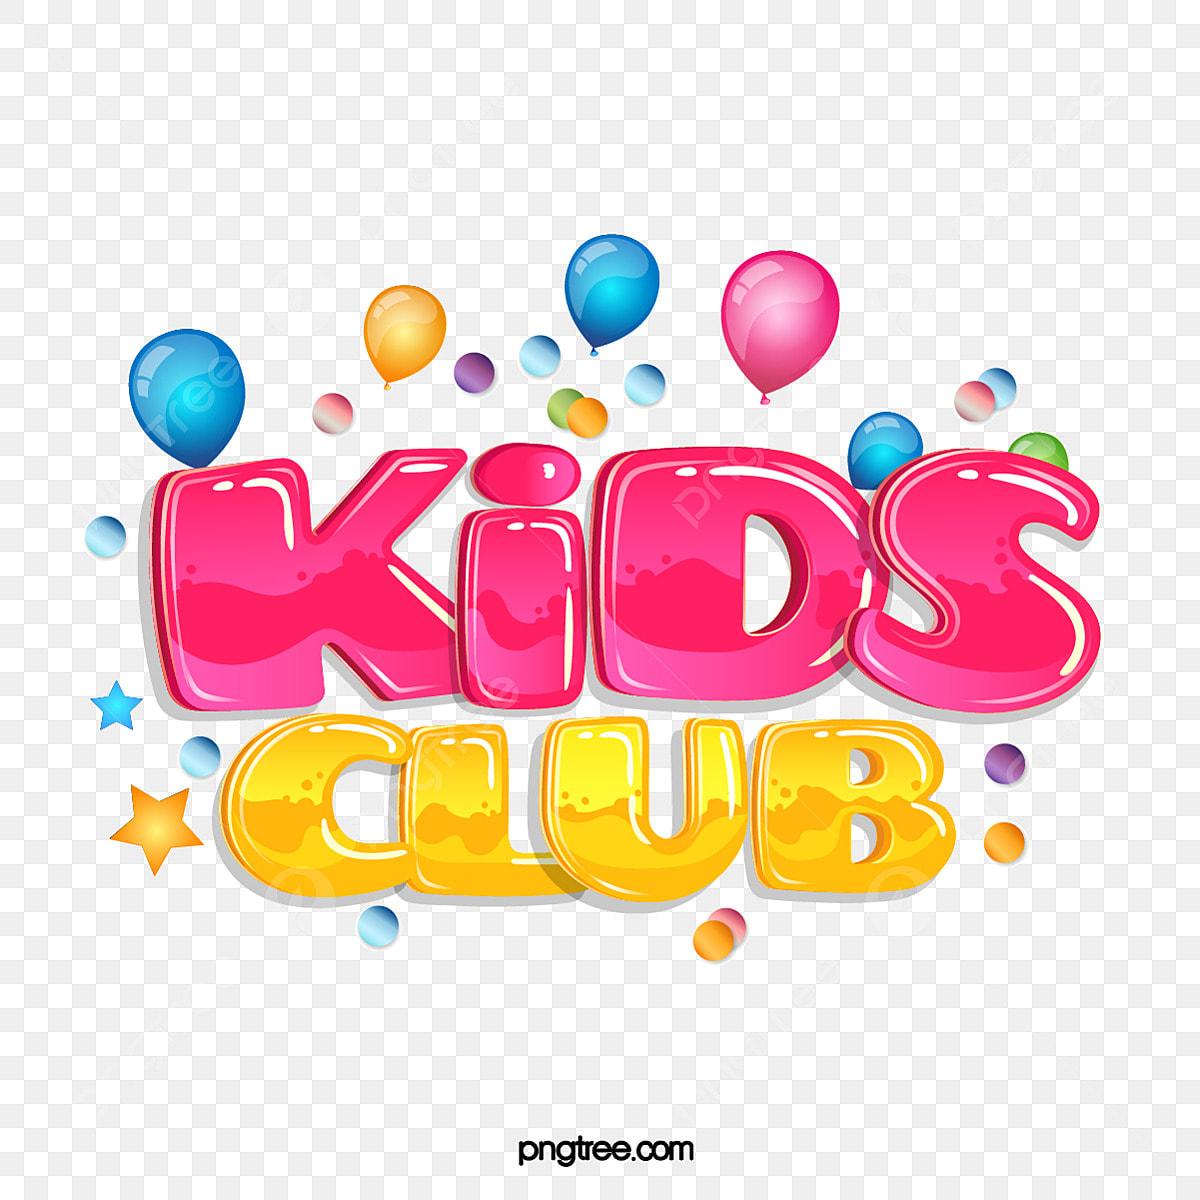 Kids Club Cute Gradient Creative Jelly Gradient Stereo Word Art